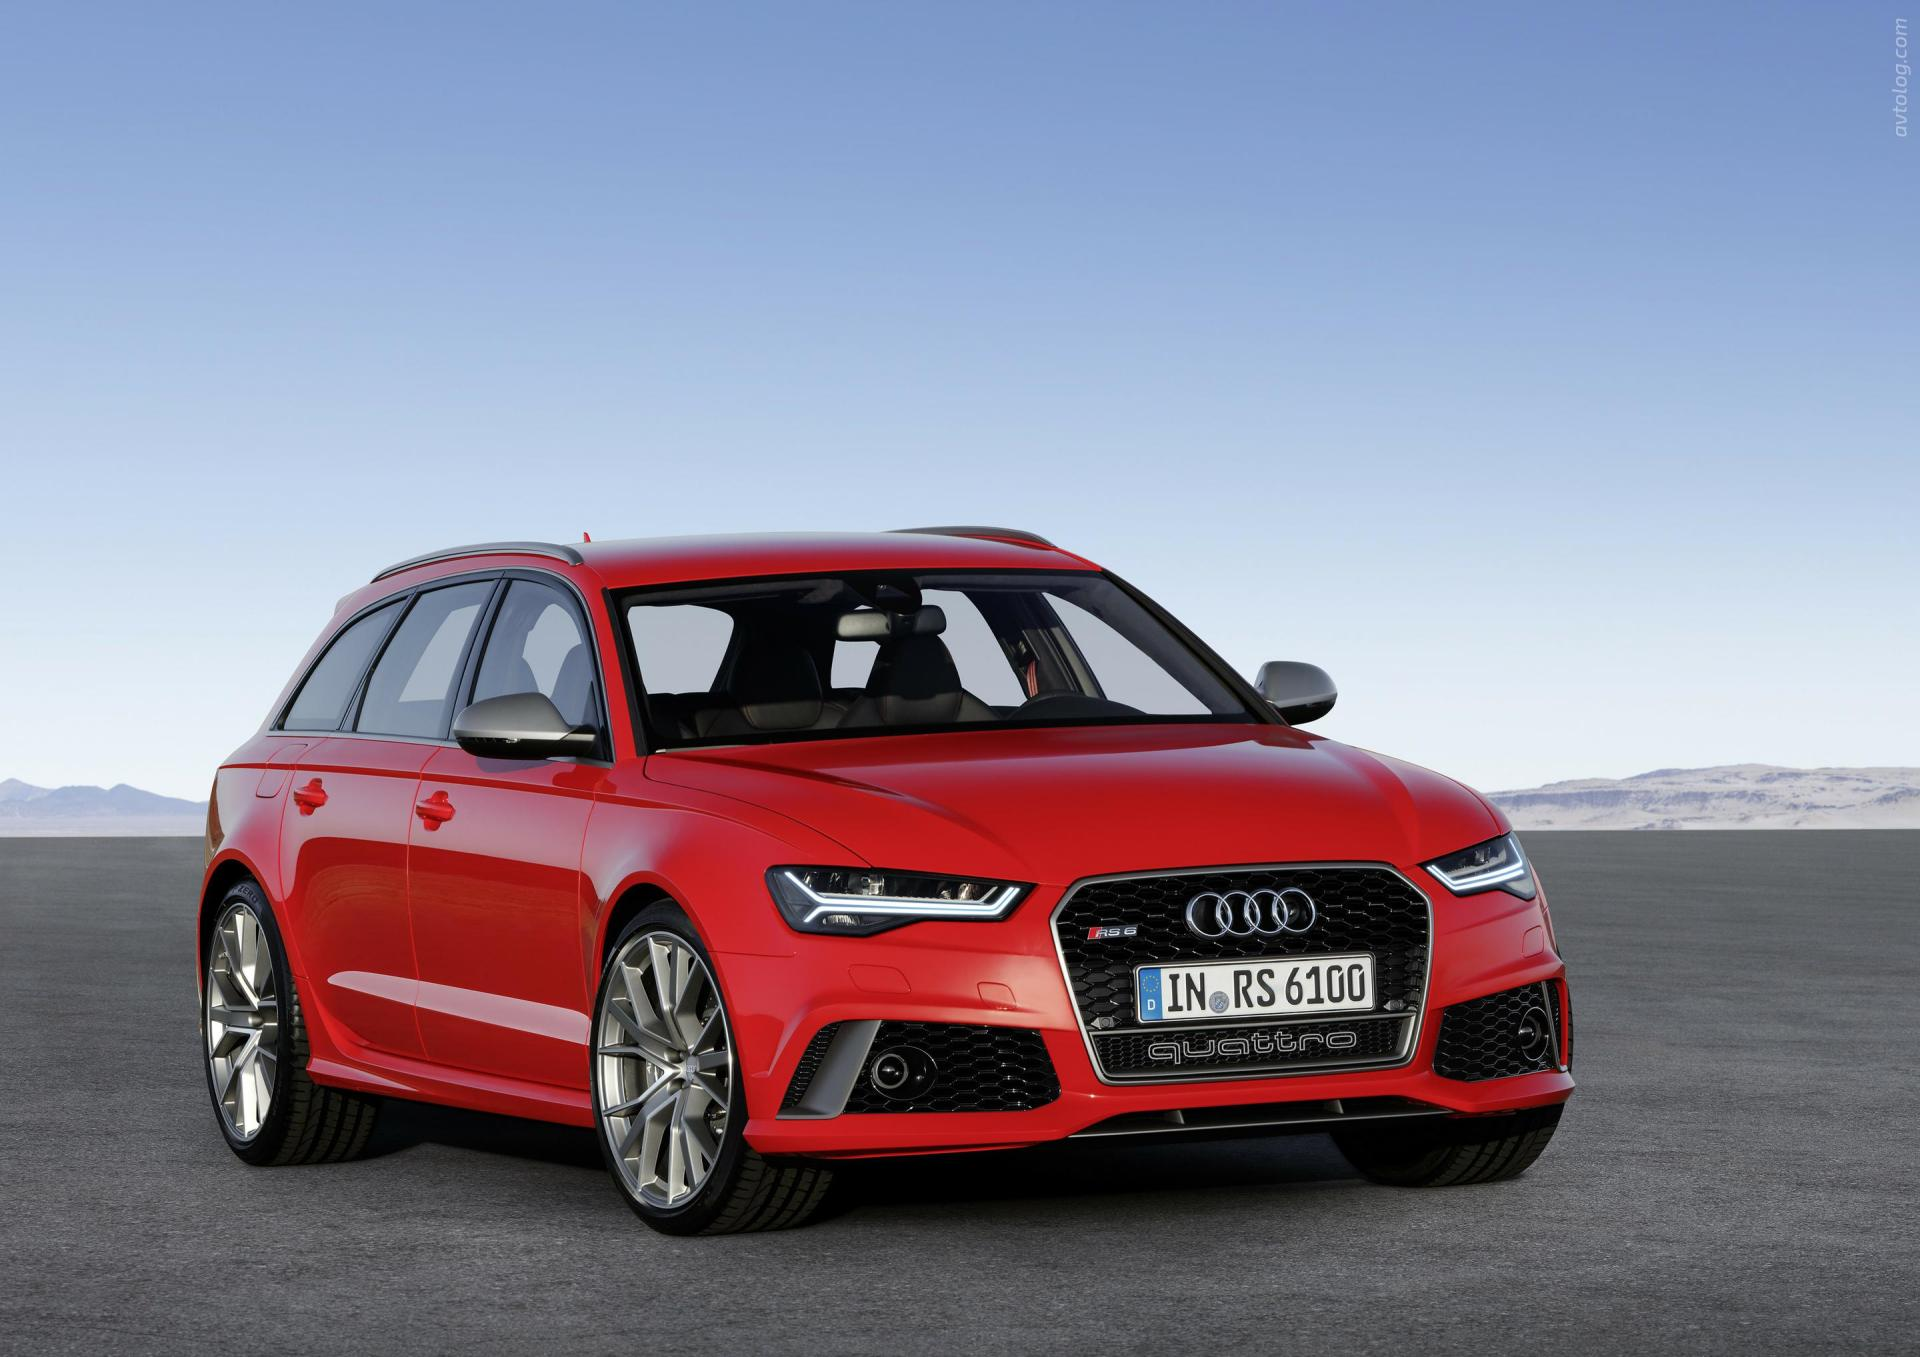 Audi RS 6 Avant Performance красного цвета, вид спереди